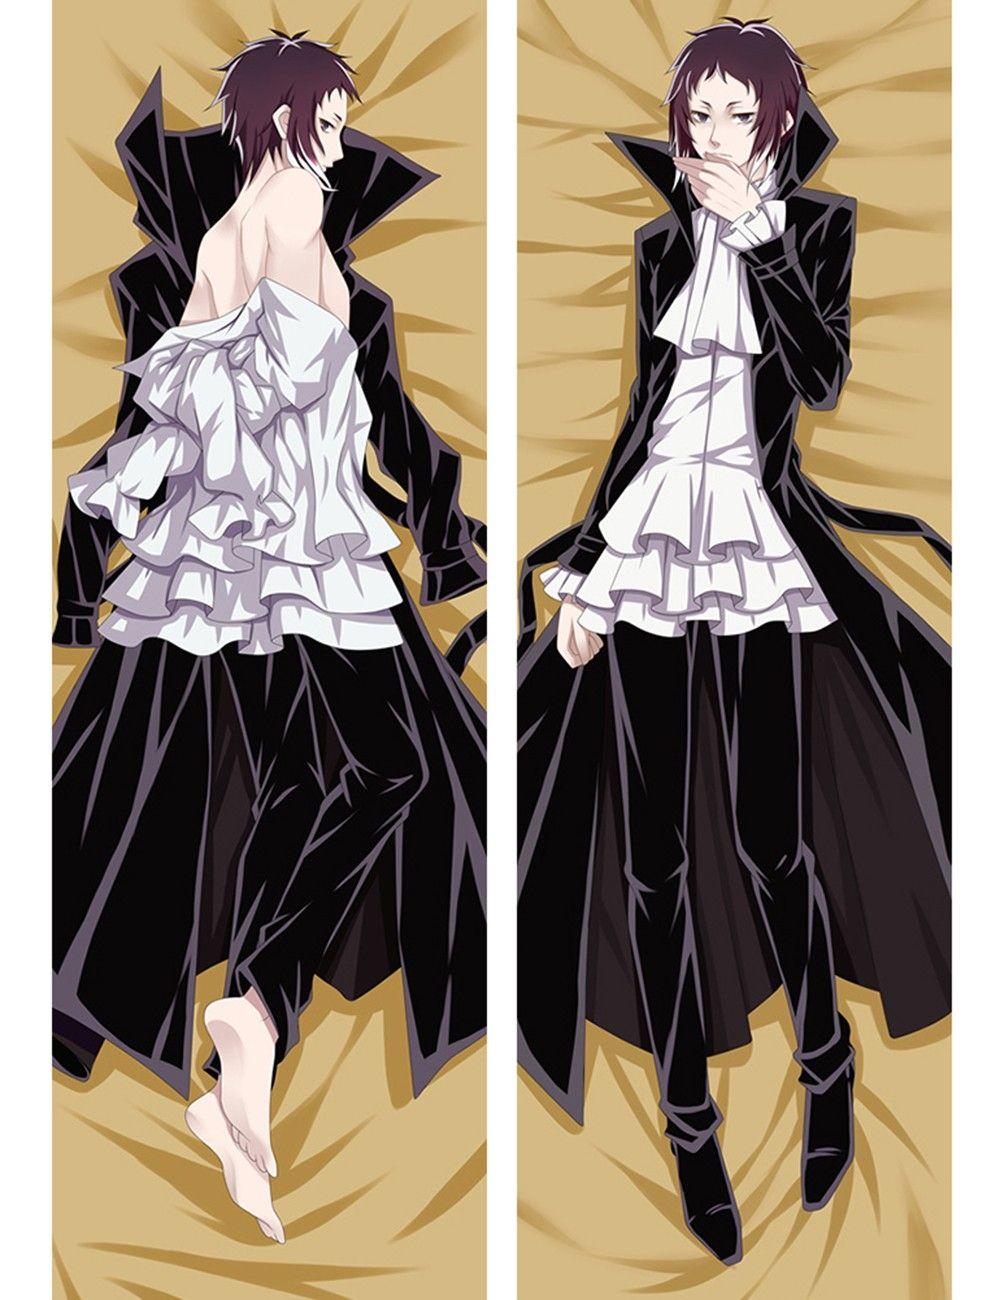 105cm Anime Bungou Stray Dogs Dakimakura Hugging Body Pillow Case Covers